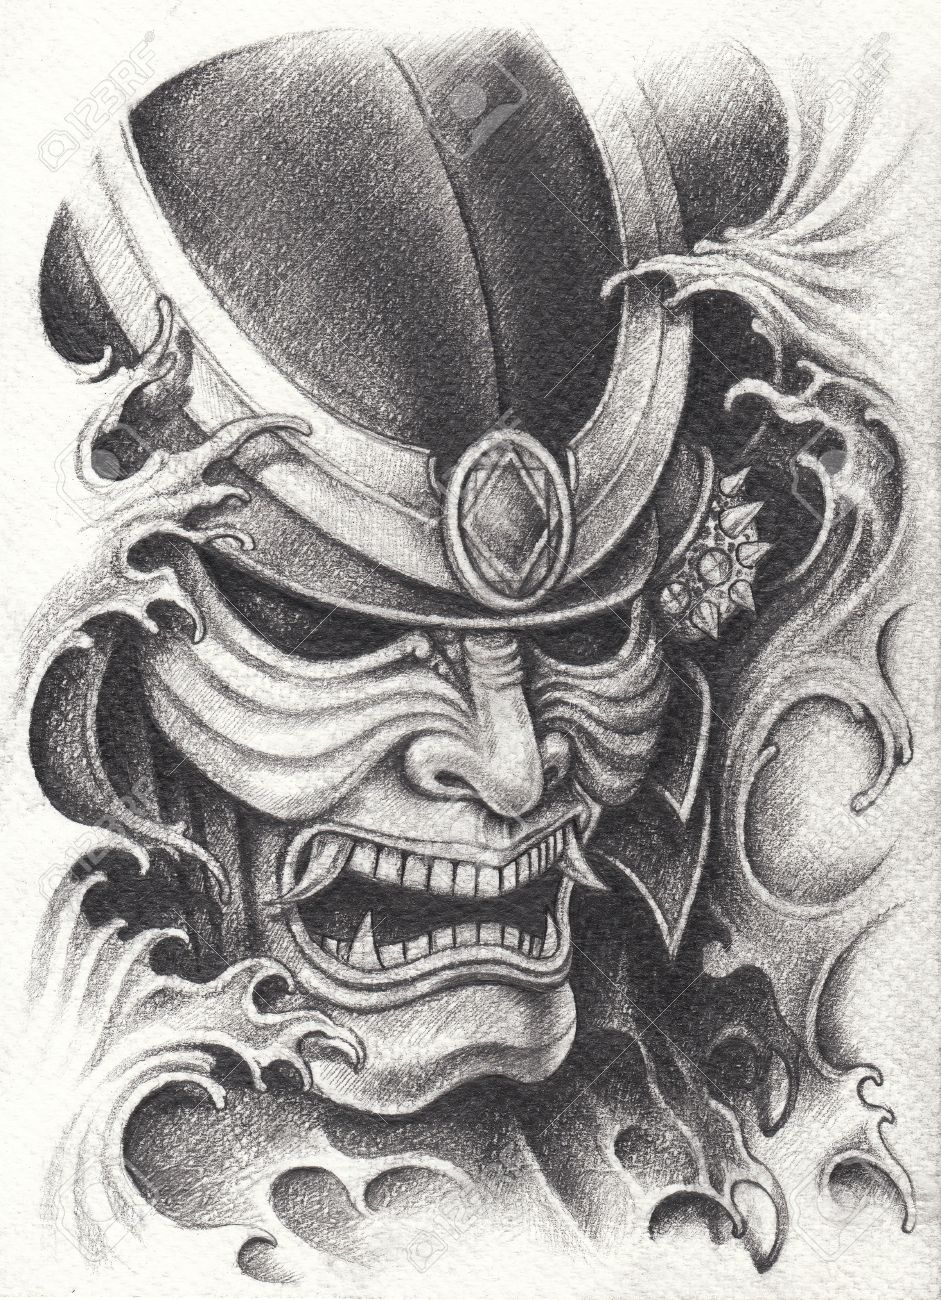 77440783 diseño del tatuaje del guerrero del samurai dibujo de lápiz de mano en el papel